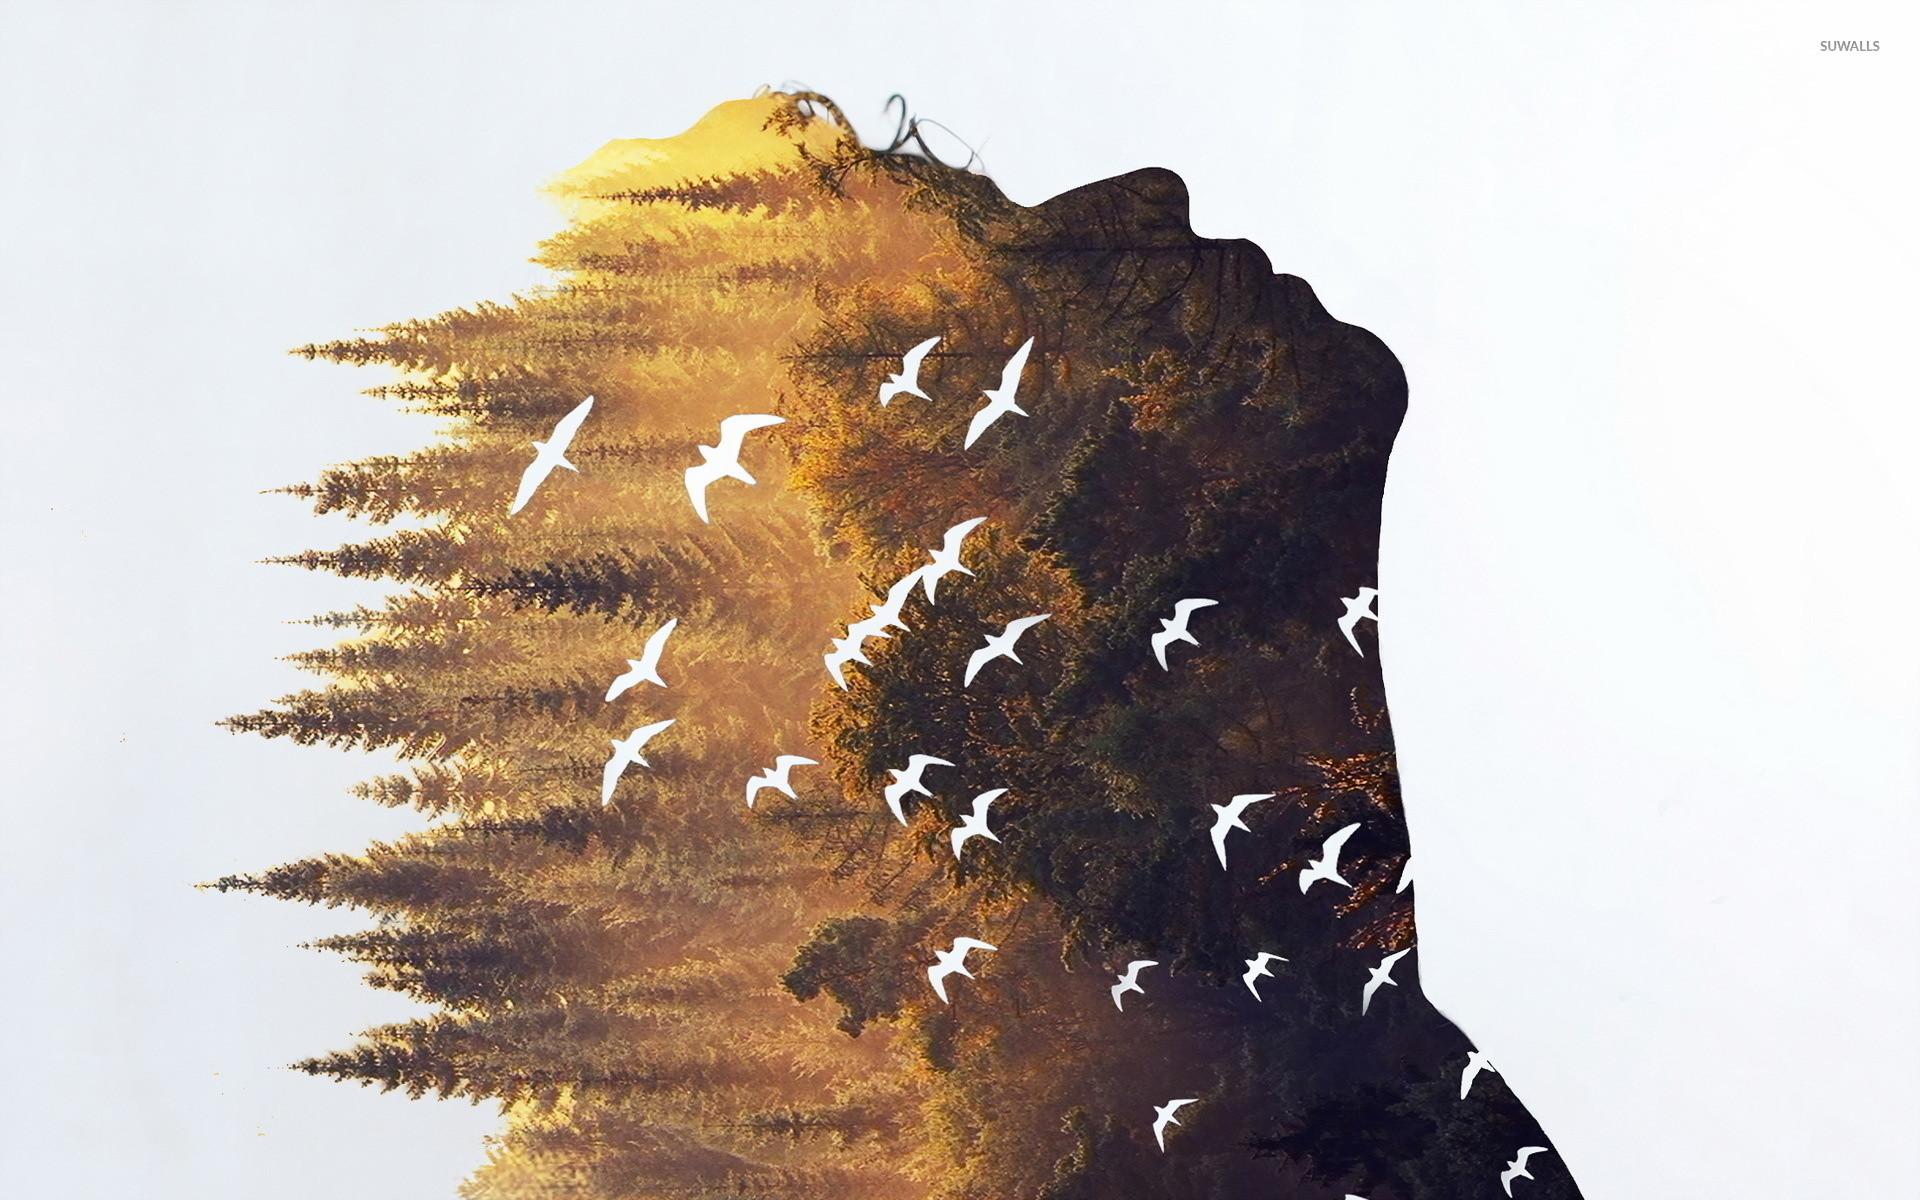 Forest in a silhouette wallpaper jpg